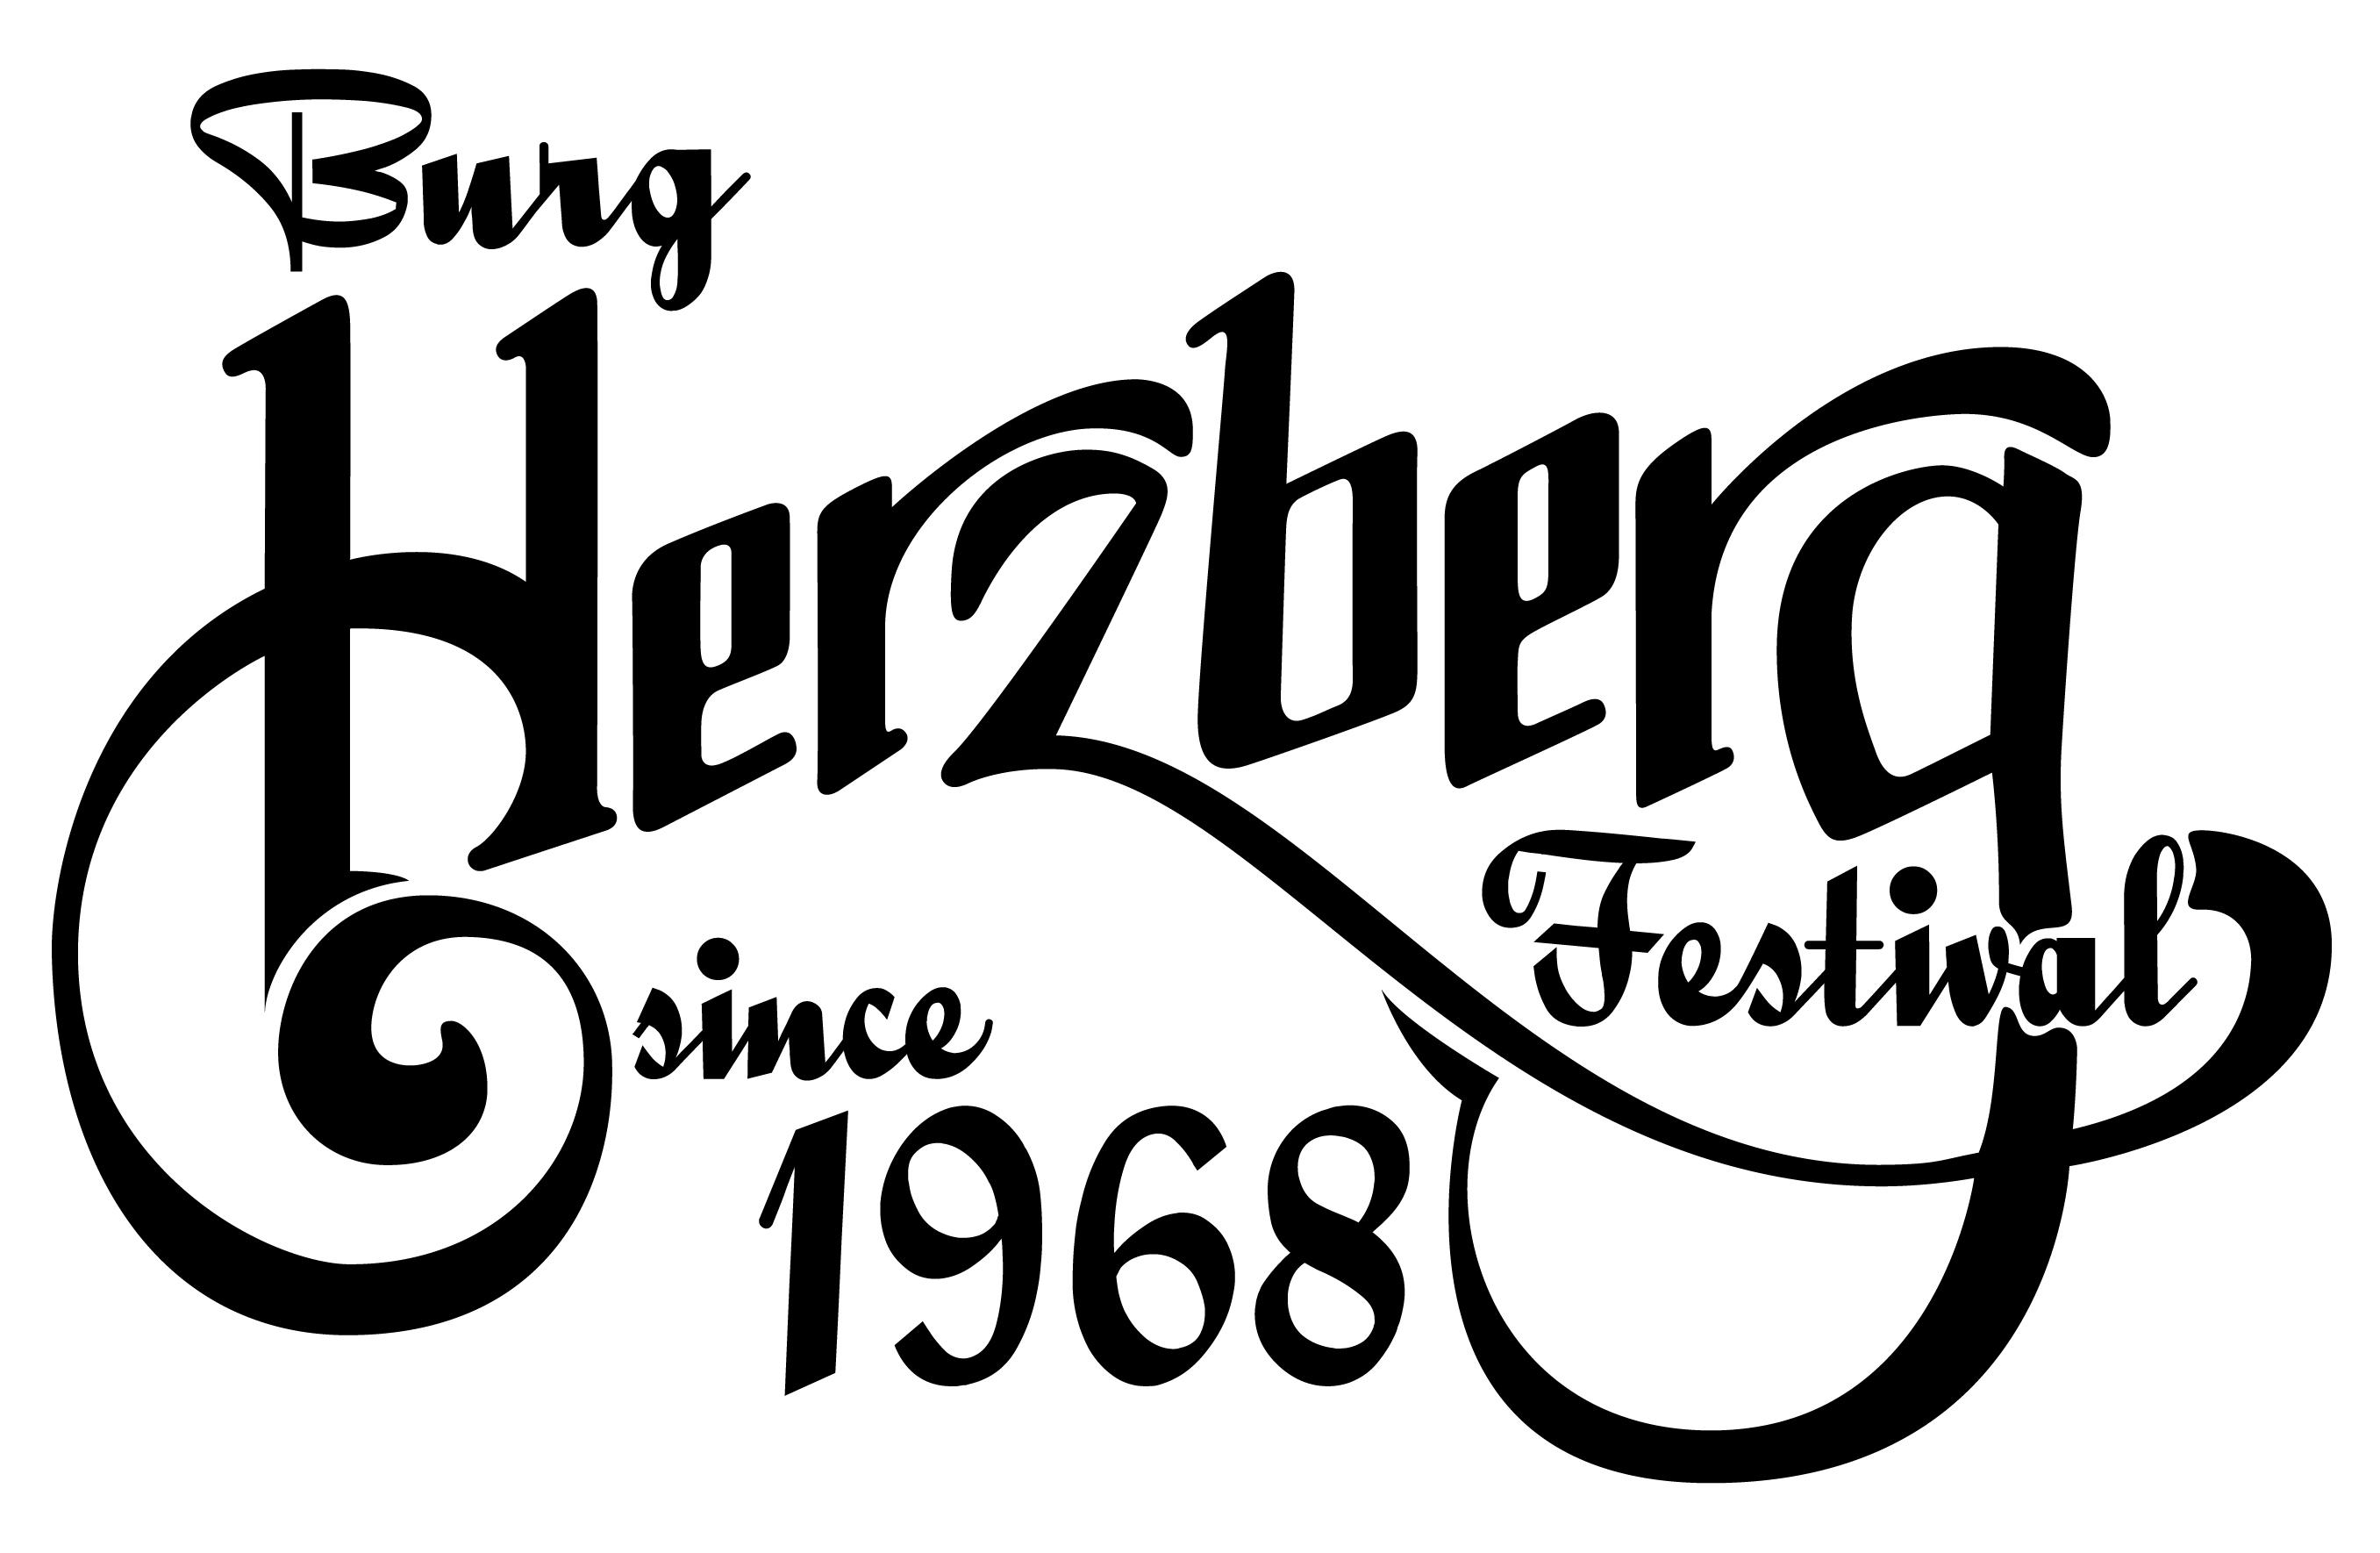 Burg Herzbergfestival